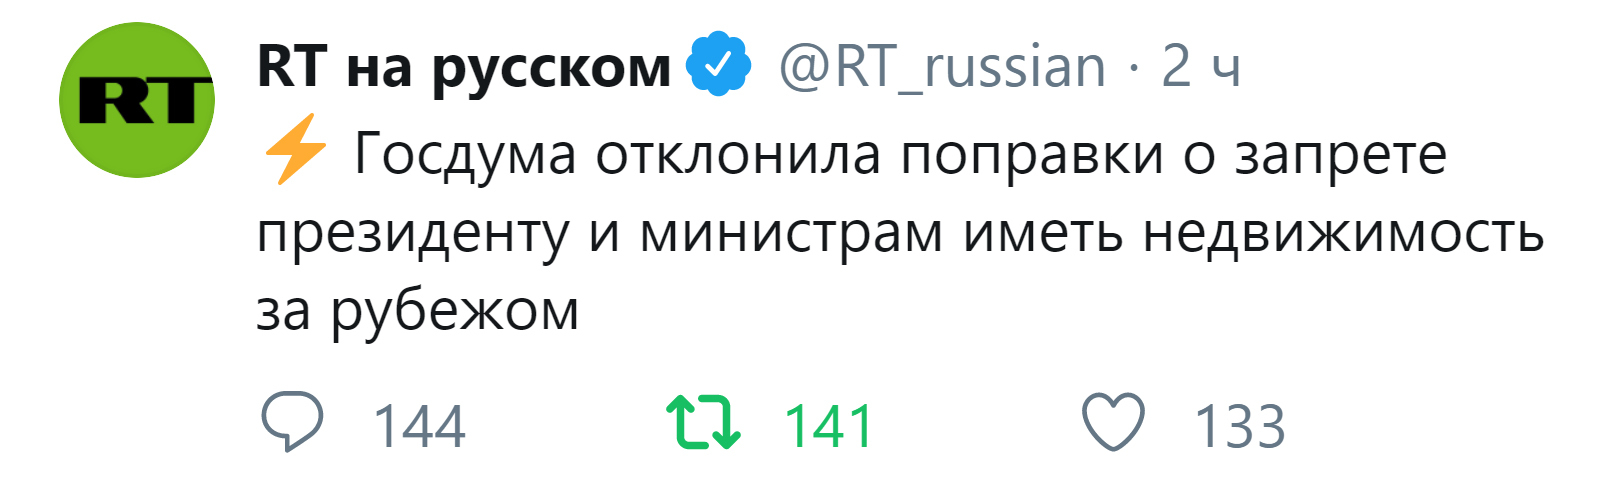 https://cs13.pikabu.ru/post_img/big/2020/03/10/8/1583846033144573246.jpg